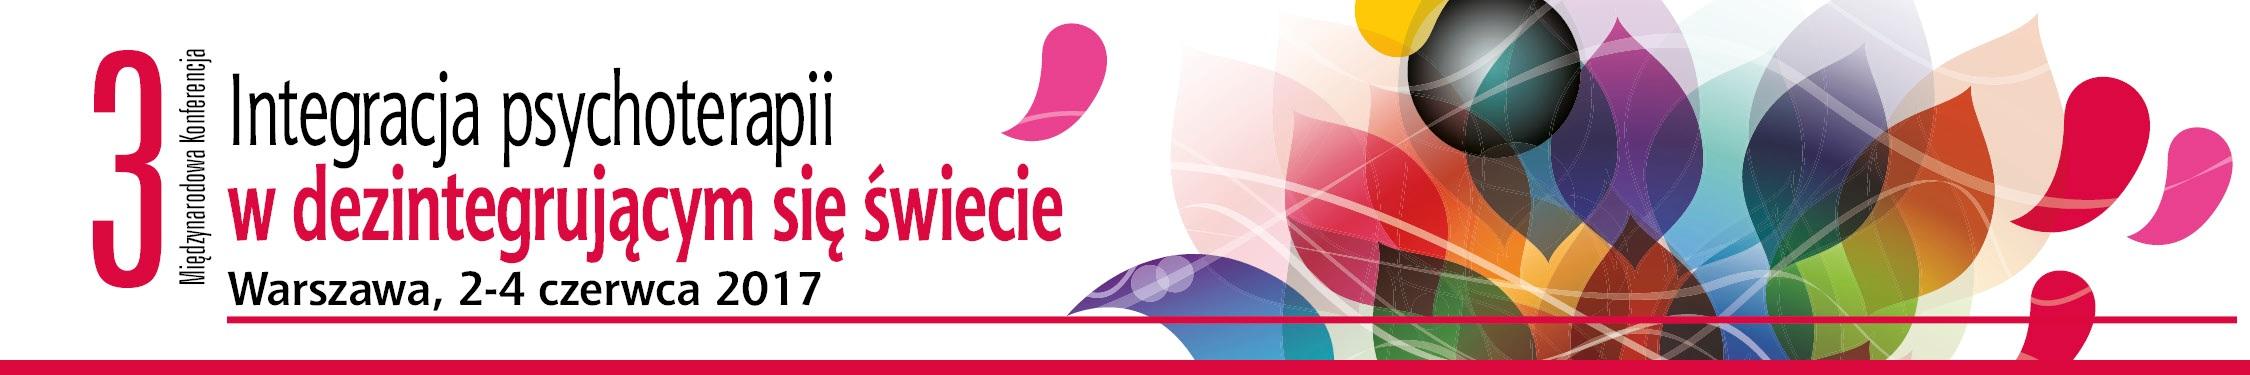 konferencja_logo-1